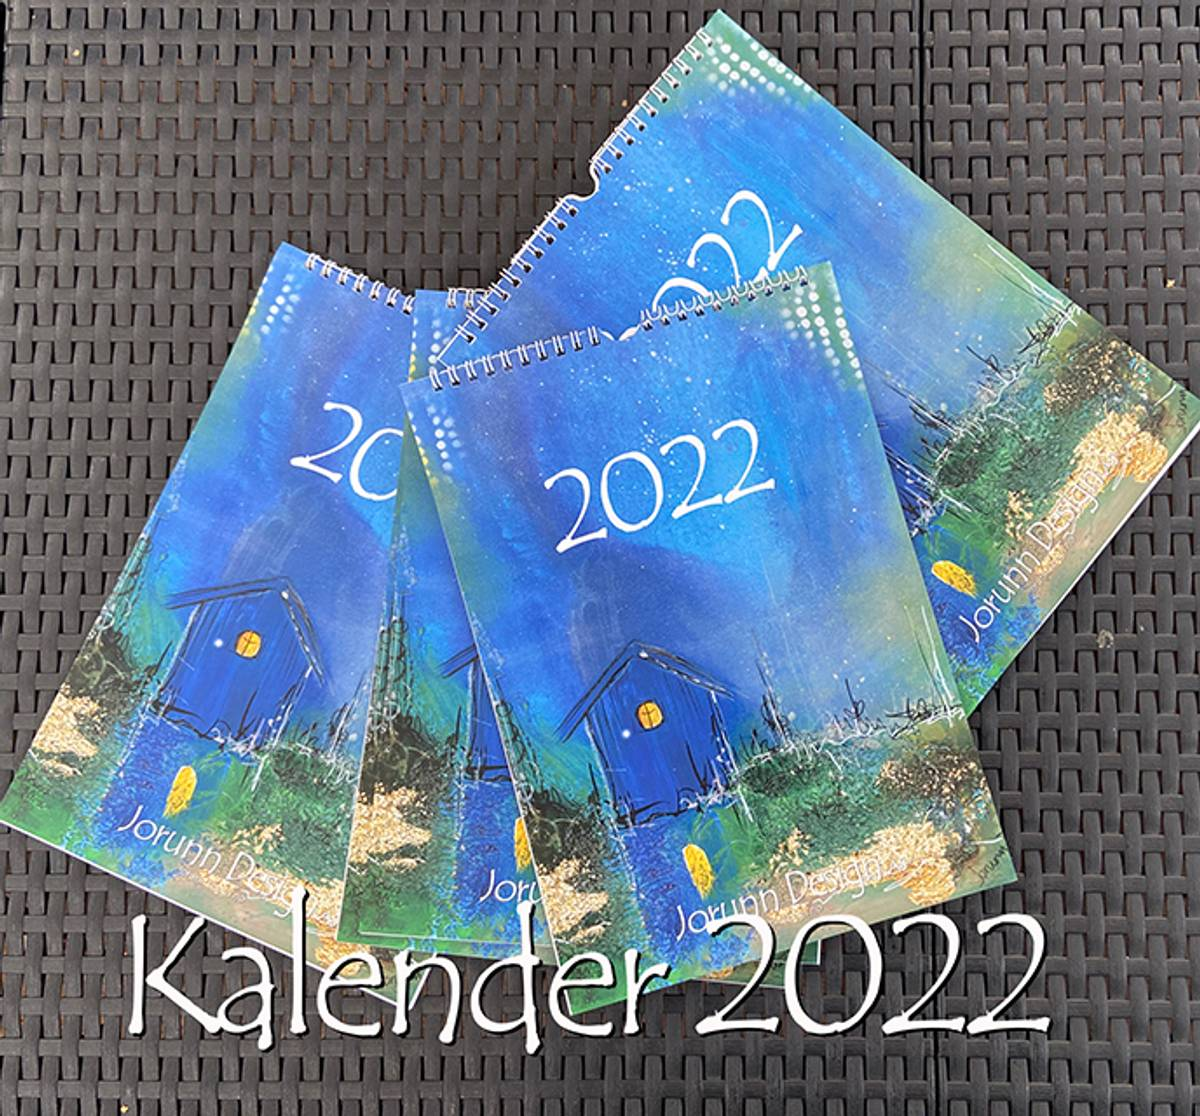 Kalender 2022 (Forhåndsbestilling)